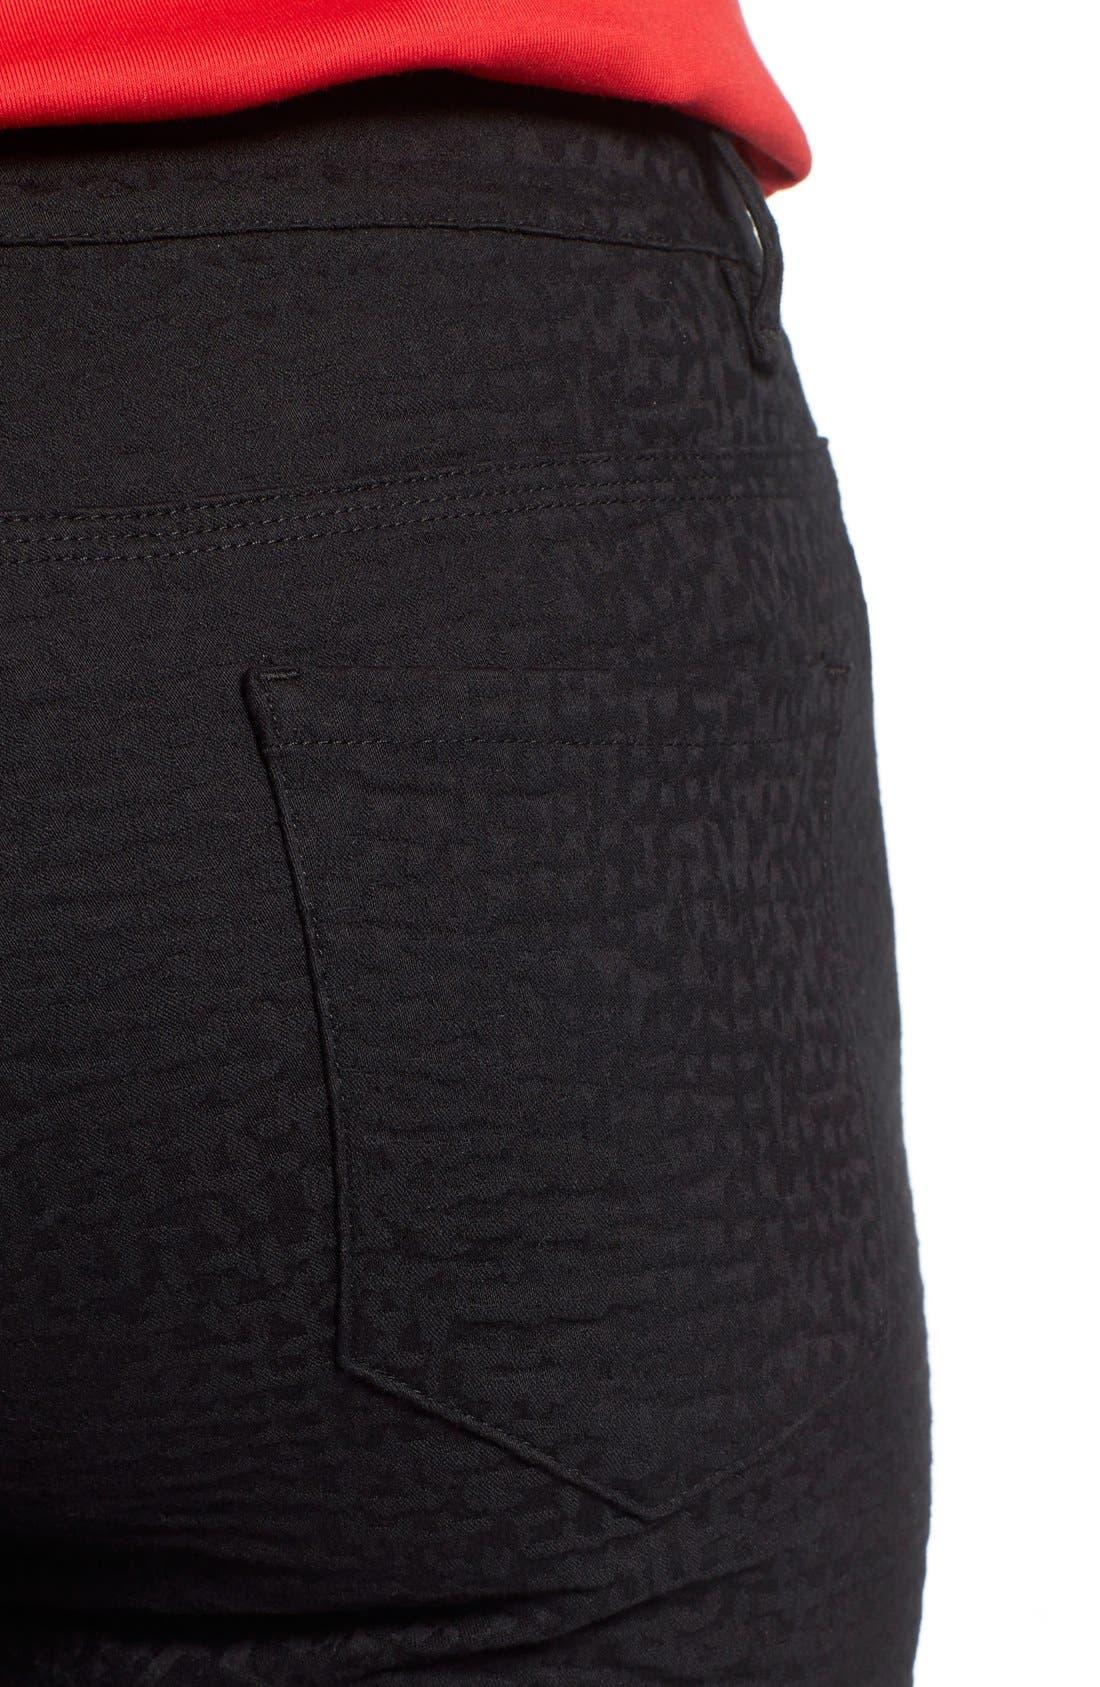 Alternate Image 4  - Lafayette 148 New York Curvy Fit Jacquard Stretch Slim Leg Jeans (Black) (Regular & Petite)